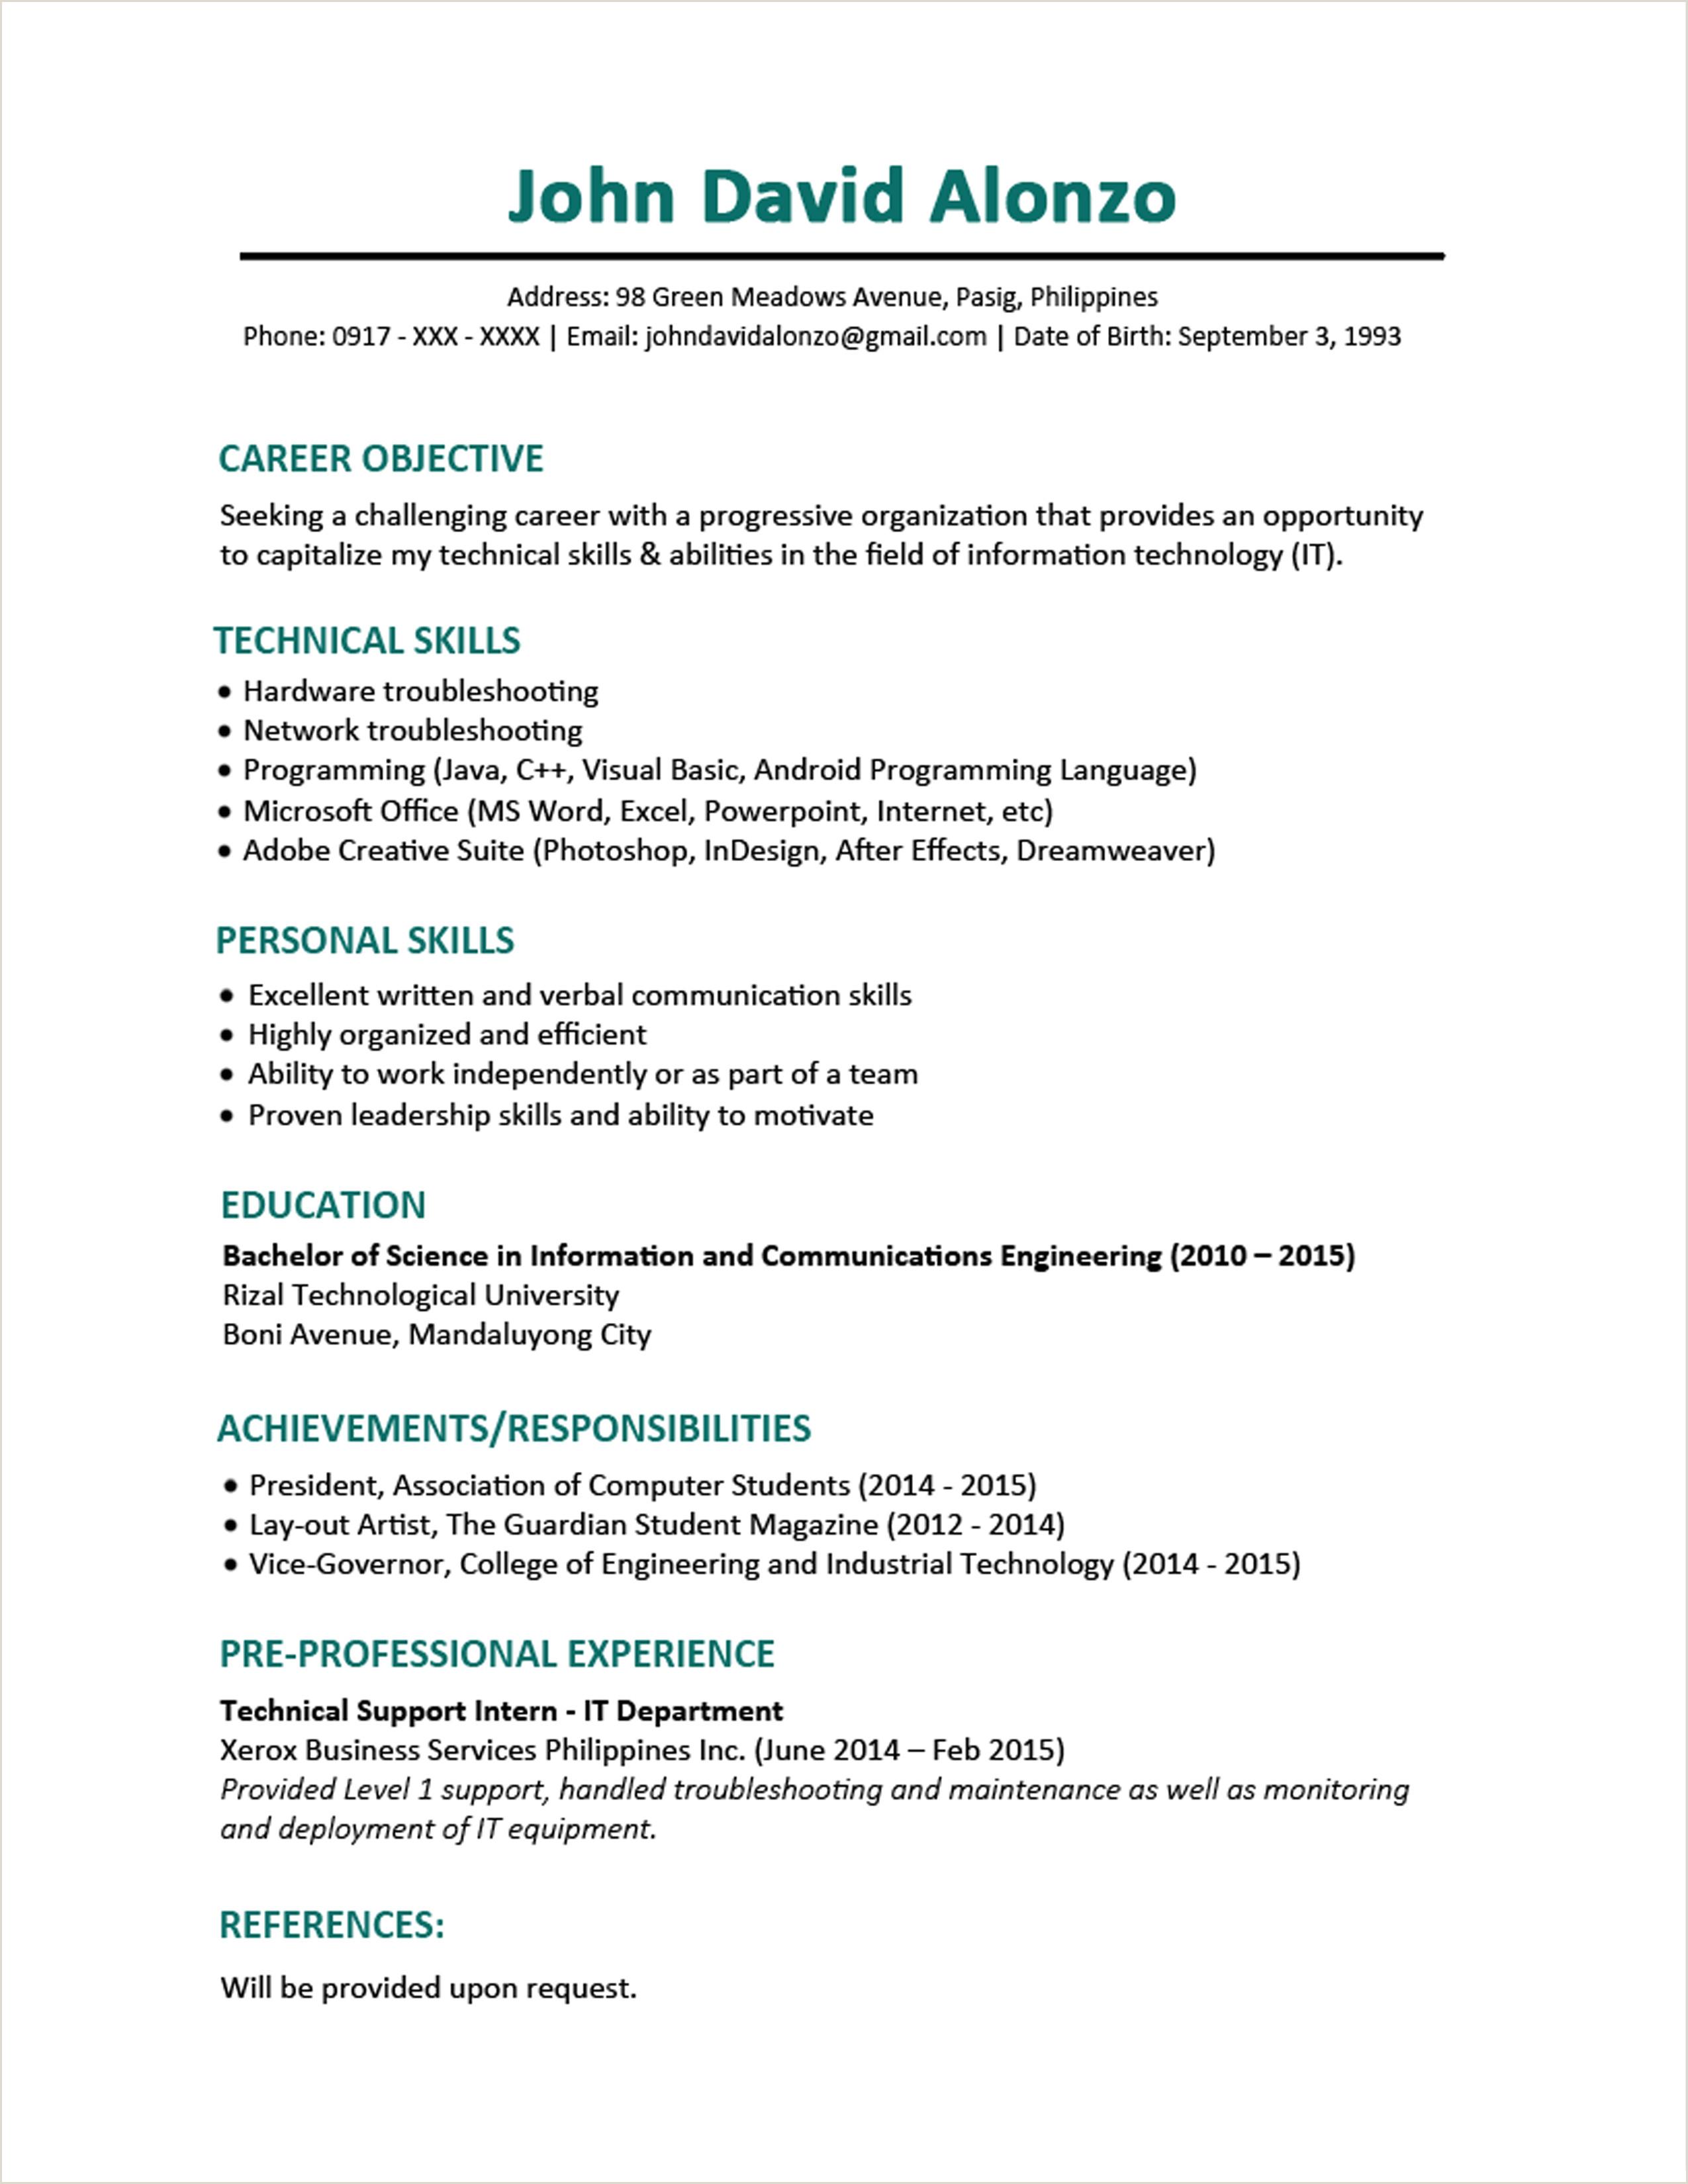 Curriculum Vitae Para Completar Y Descargar Pin by Resumance On Resume Templates